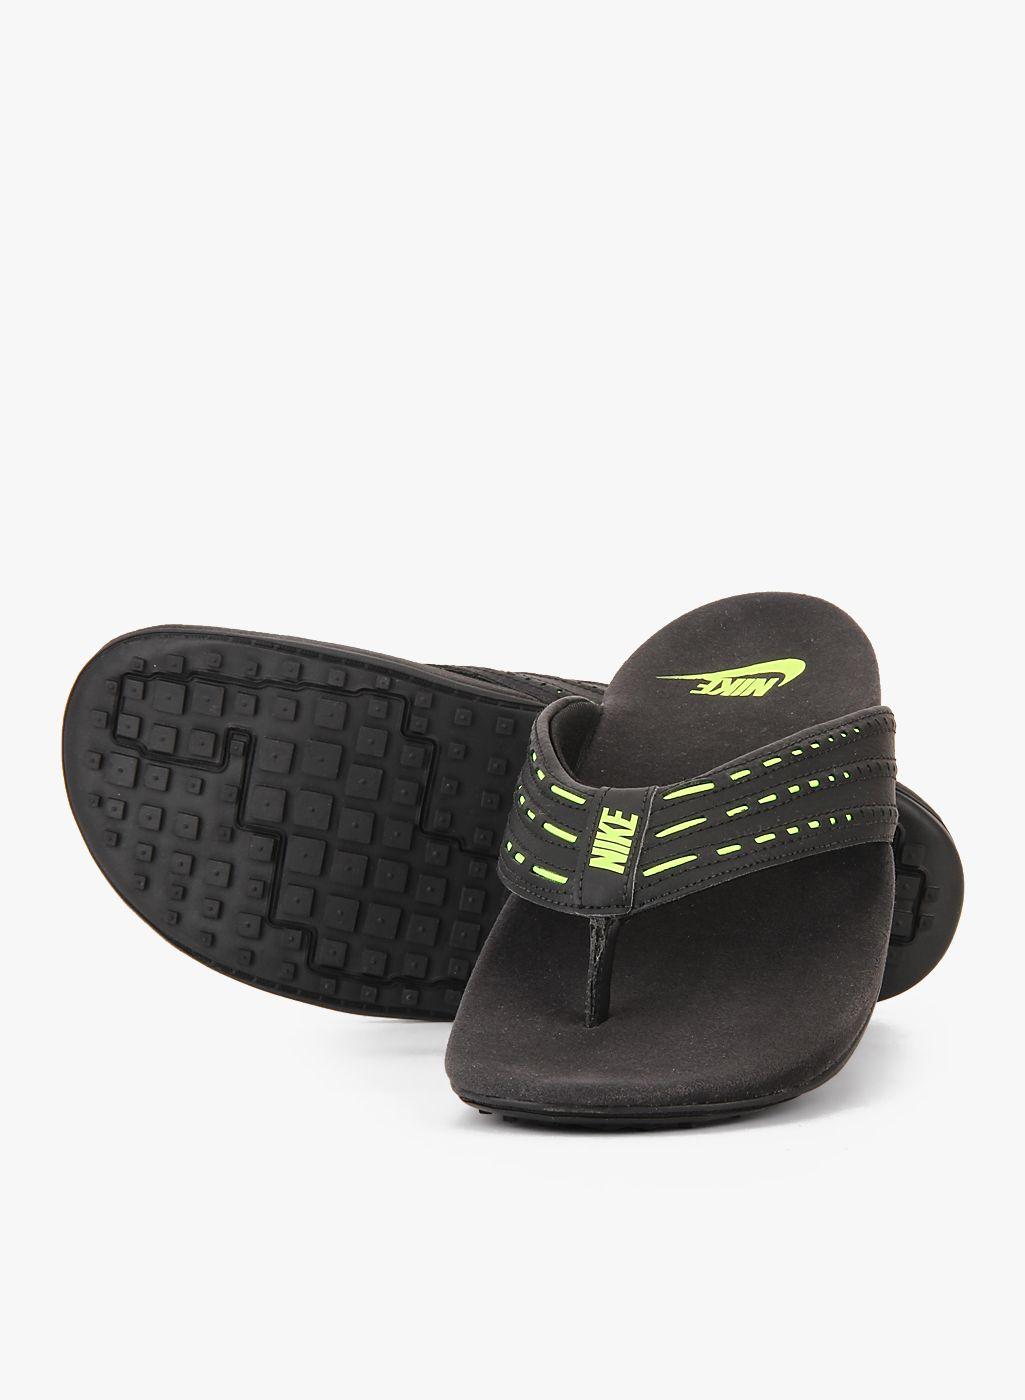 00641c0c794 Buy Nike Keeso Thong Black Slippers for Men Online India